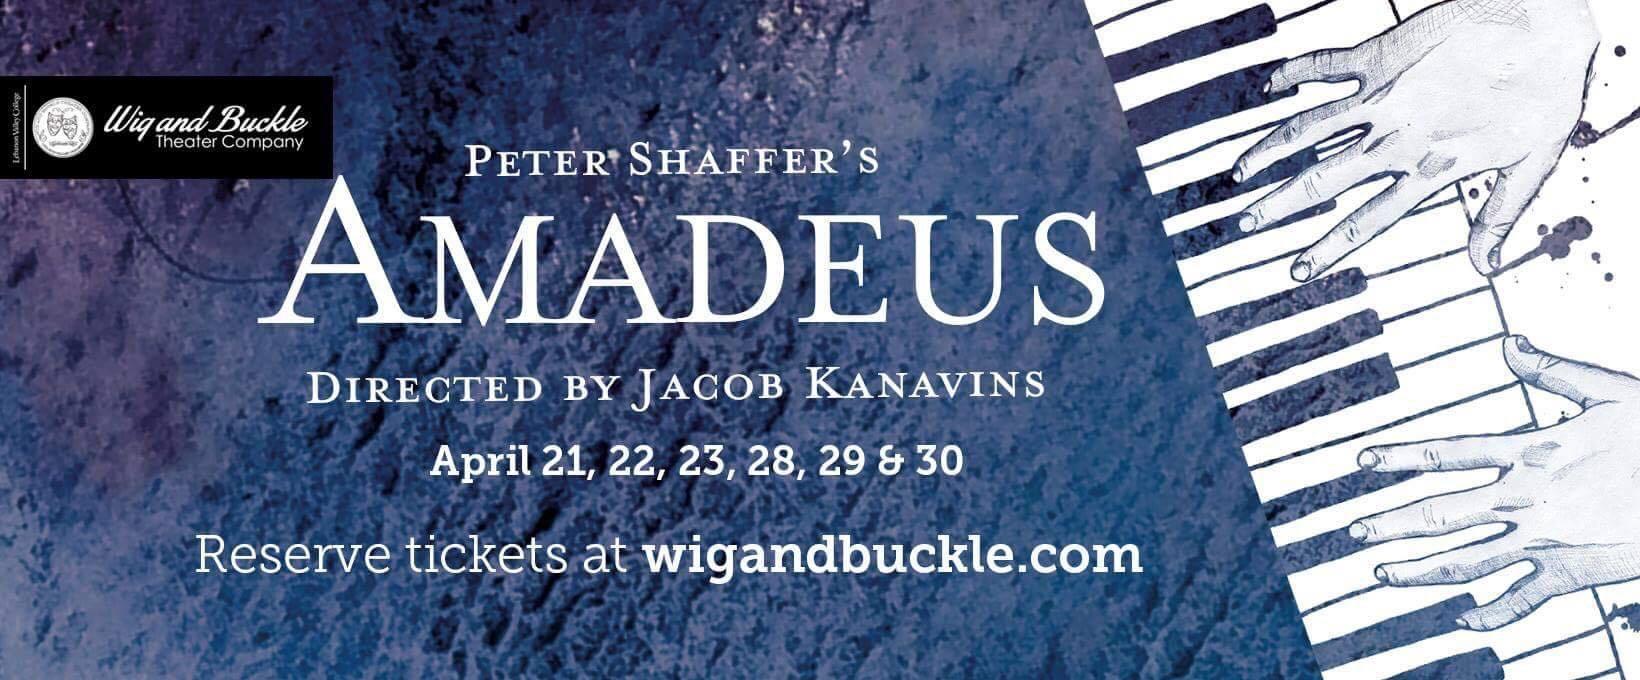 Amadeus social media banner